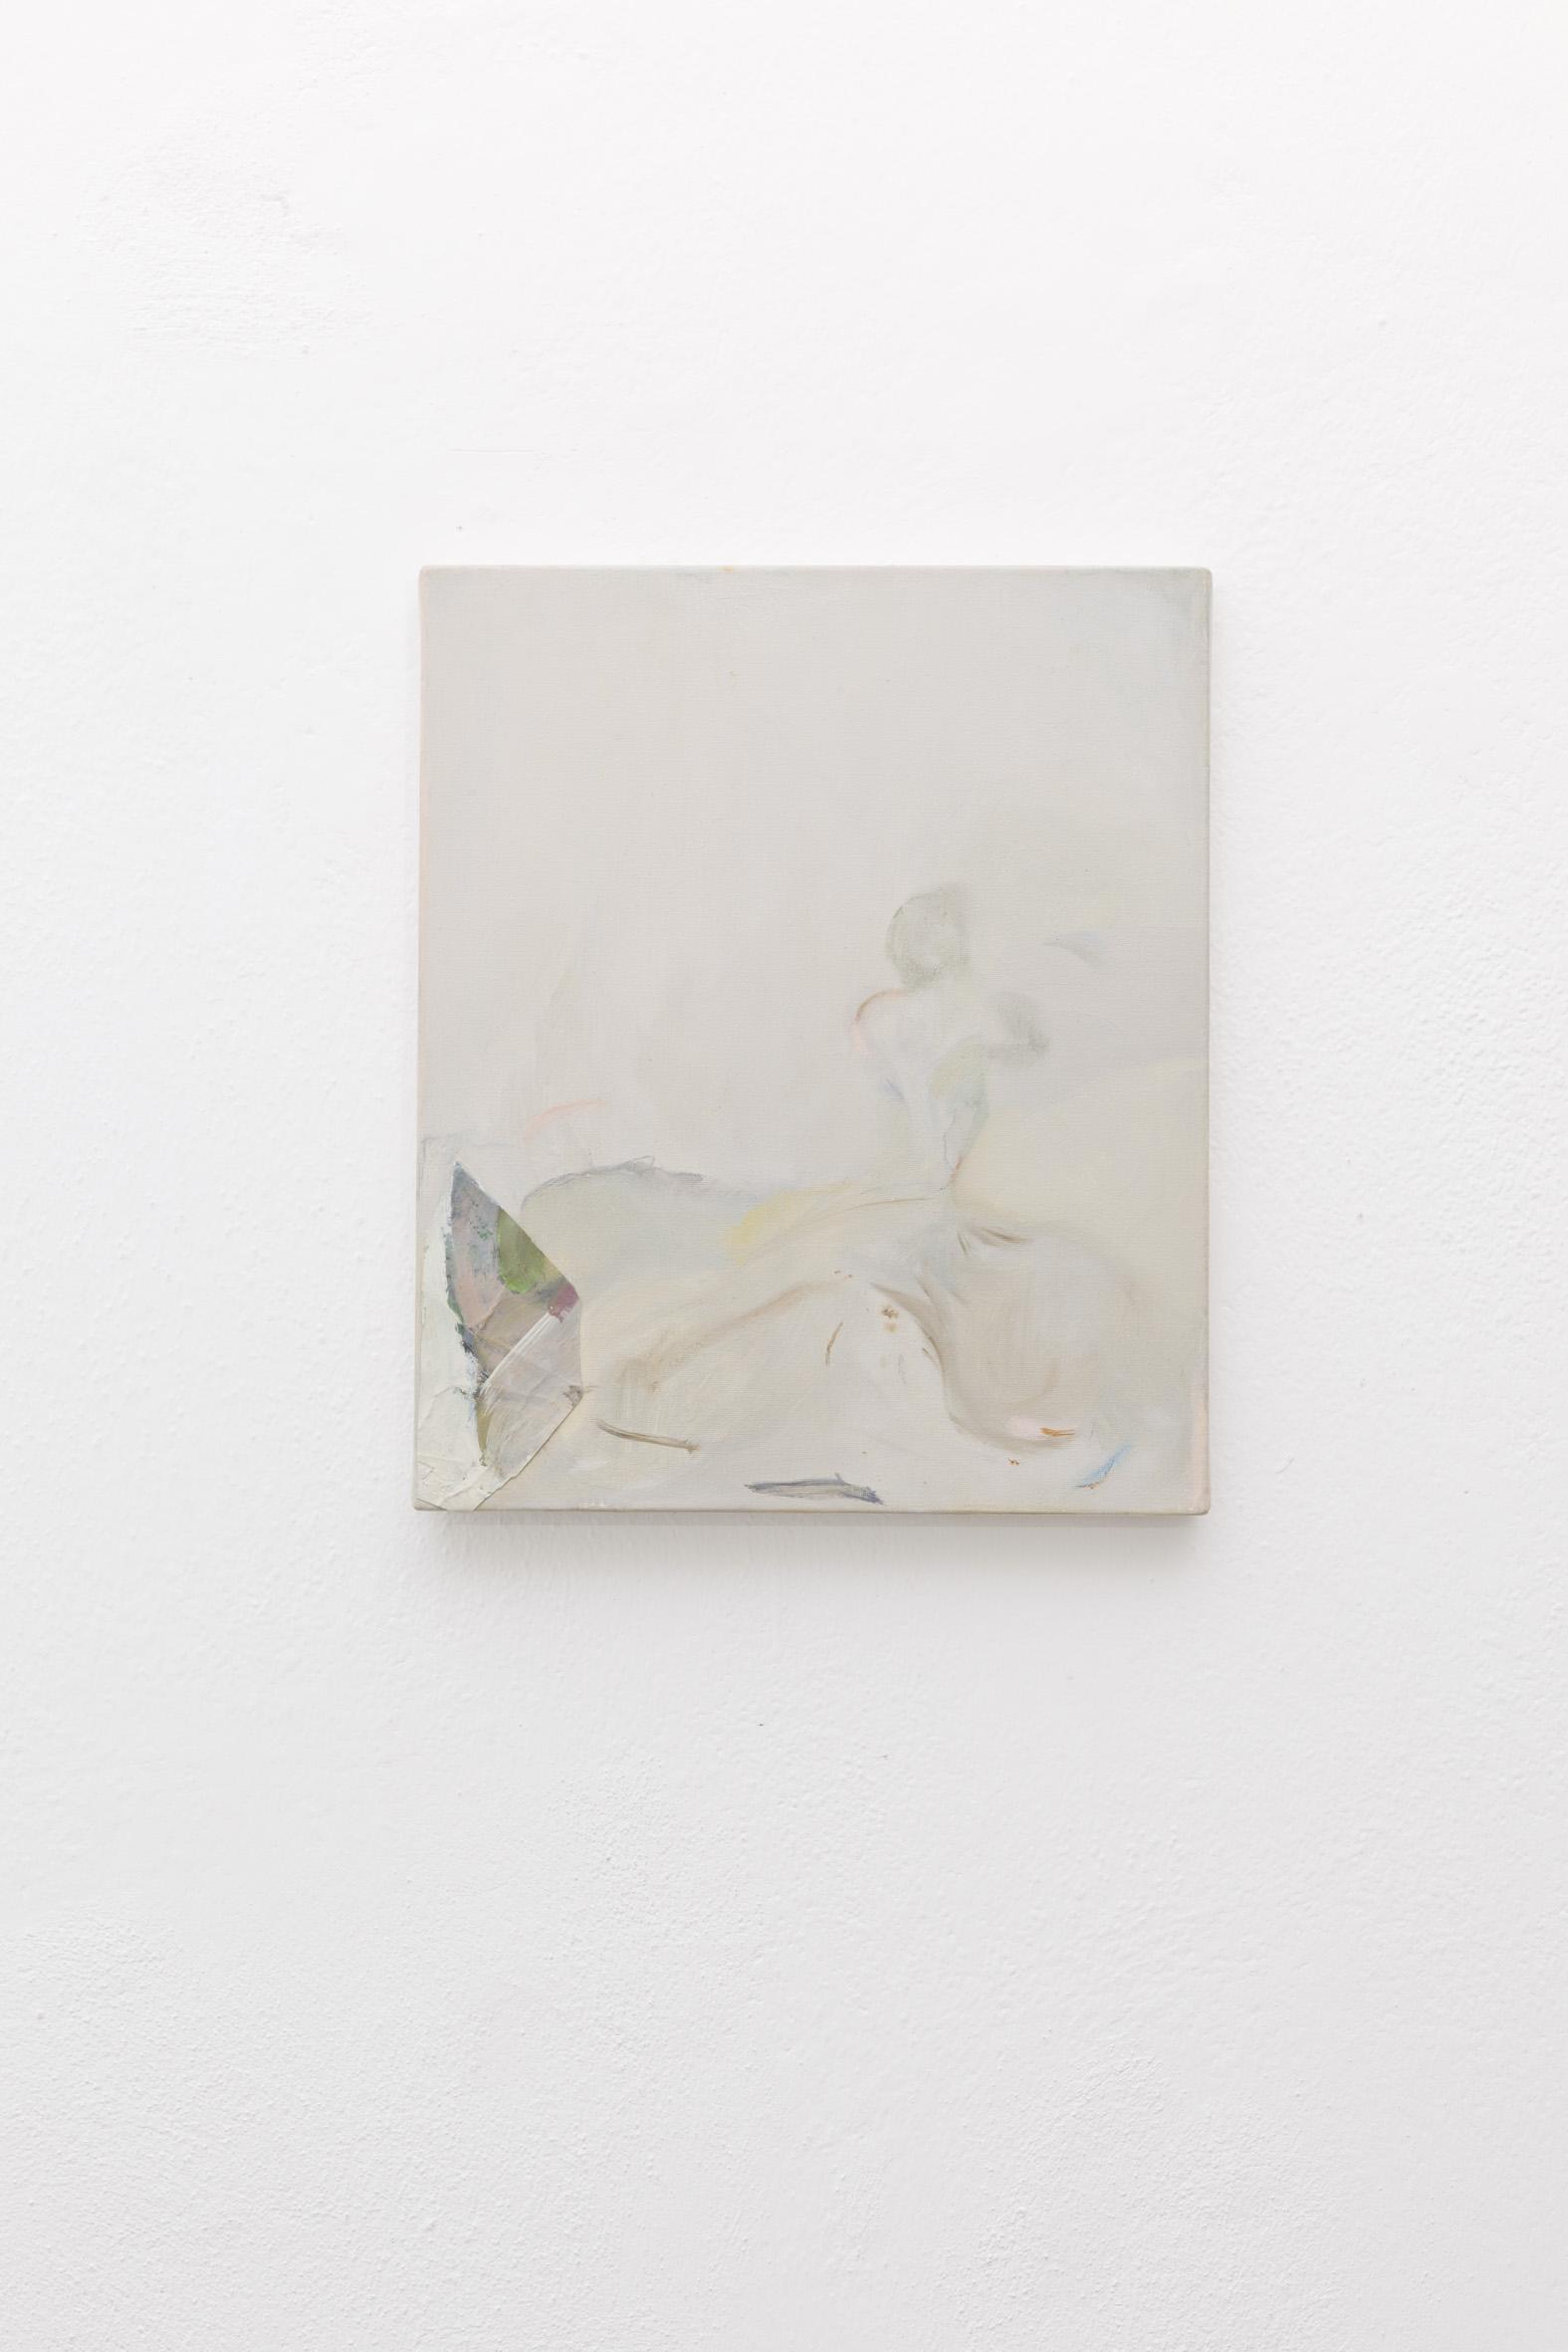 B.Meoni,  Failing  2018 - Olio su tela - cm25x30